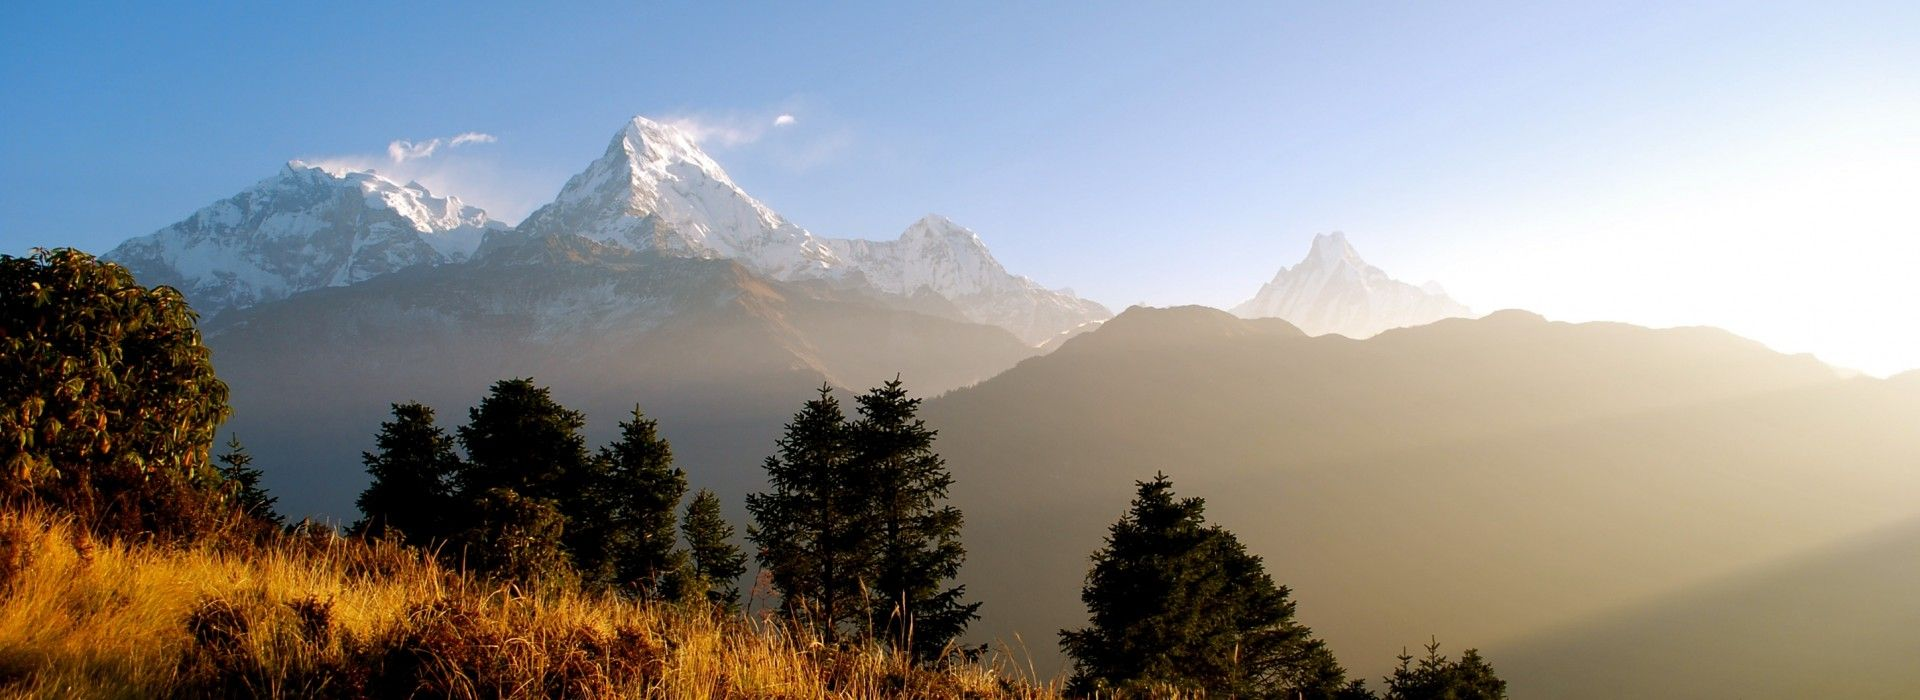 Wildlife Tours in Kathmandu